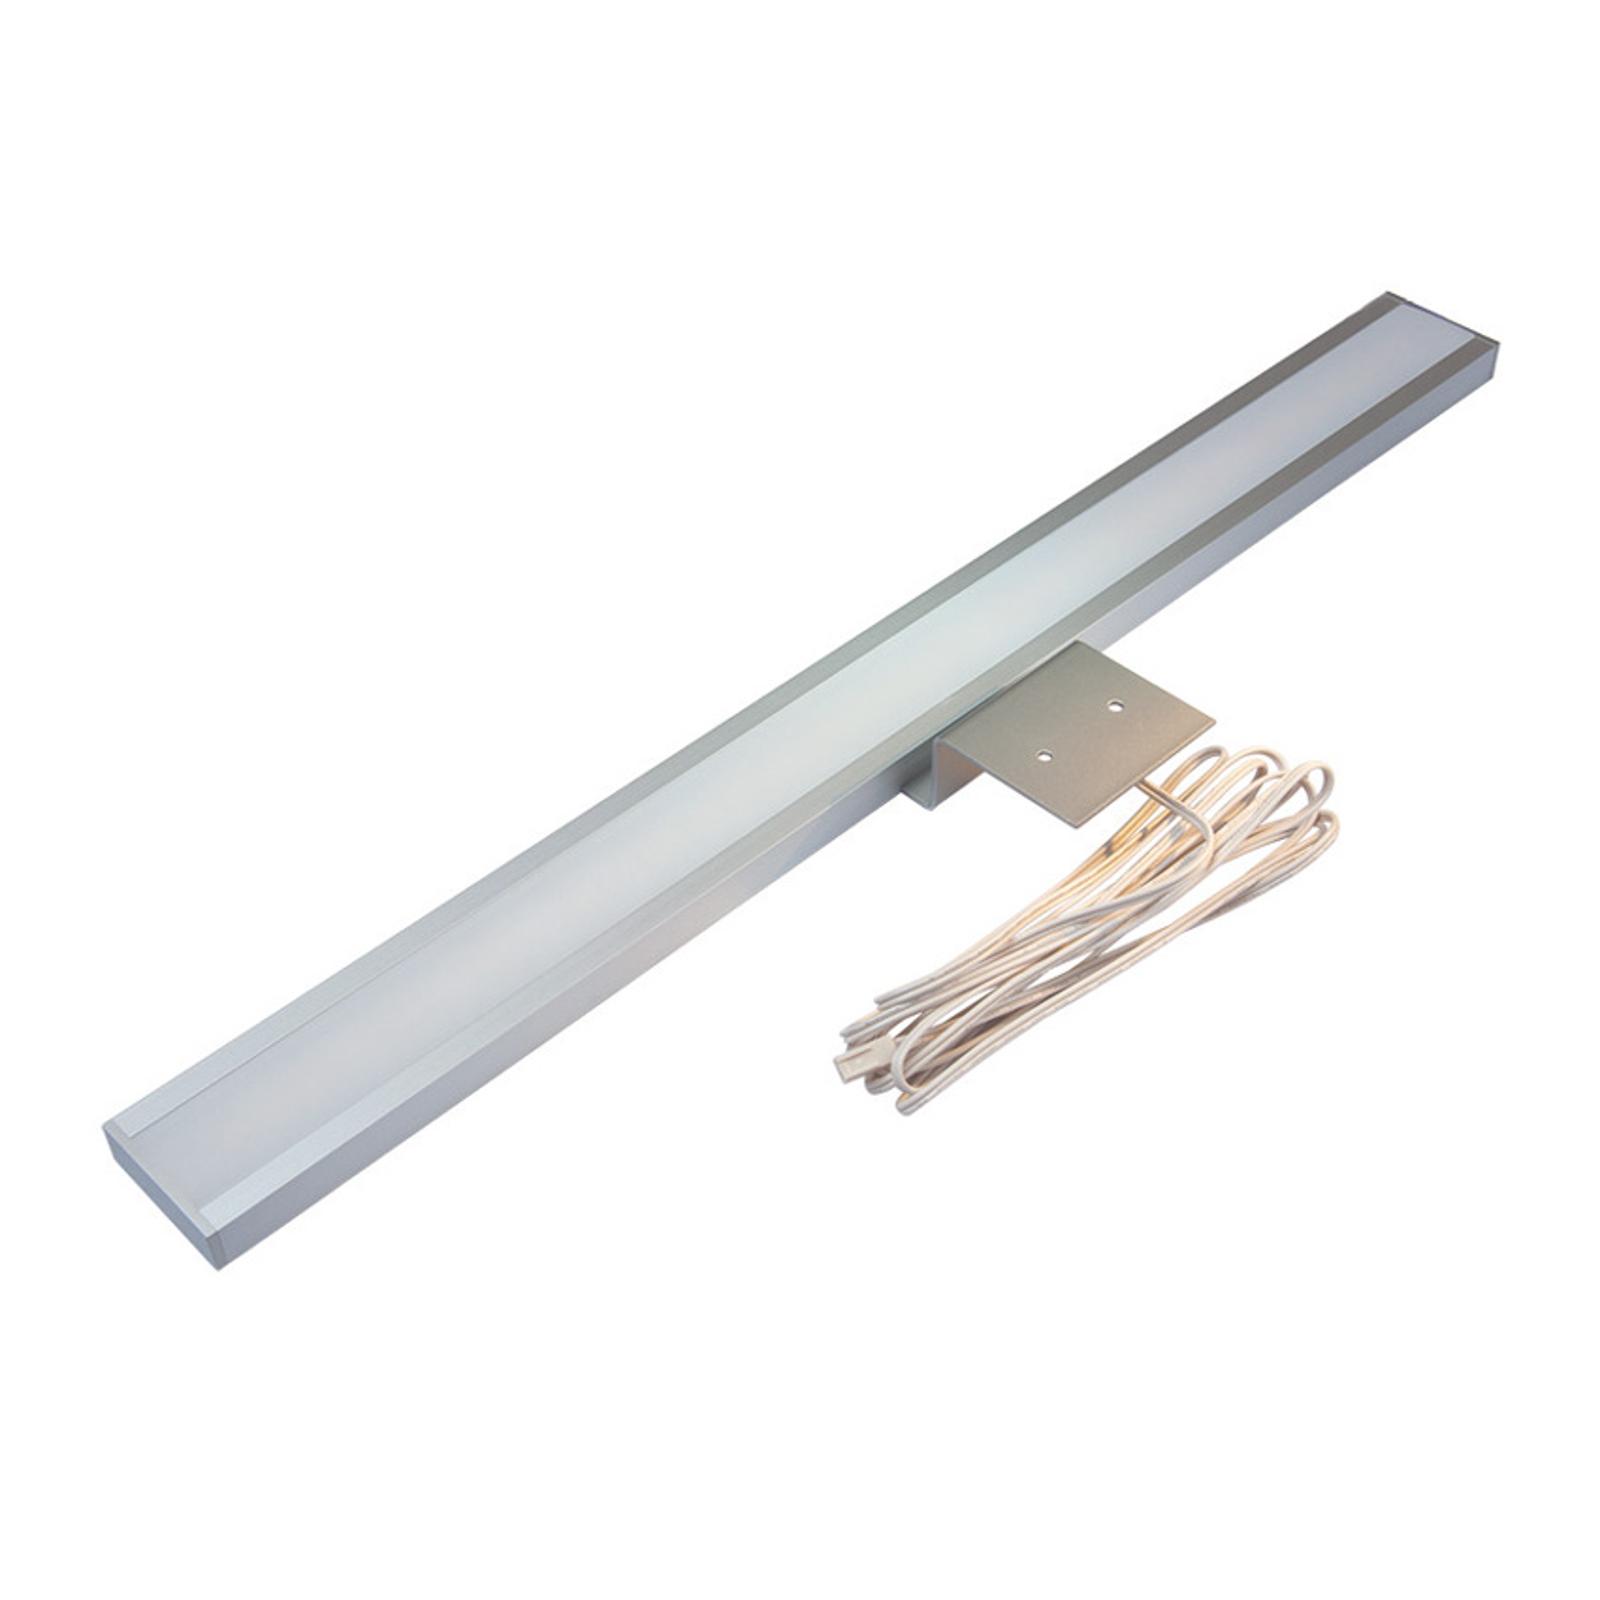 LED-möbellampa Lugano 3 000 K, 45 cm